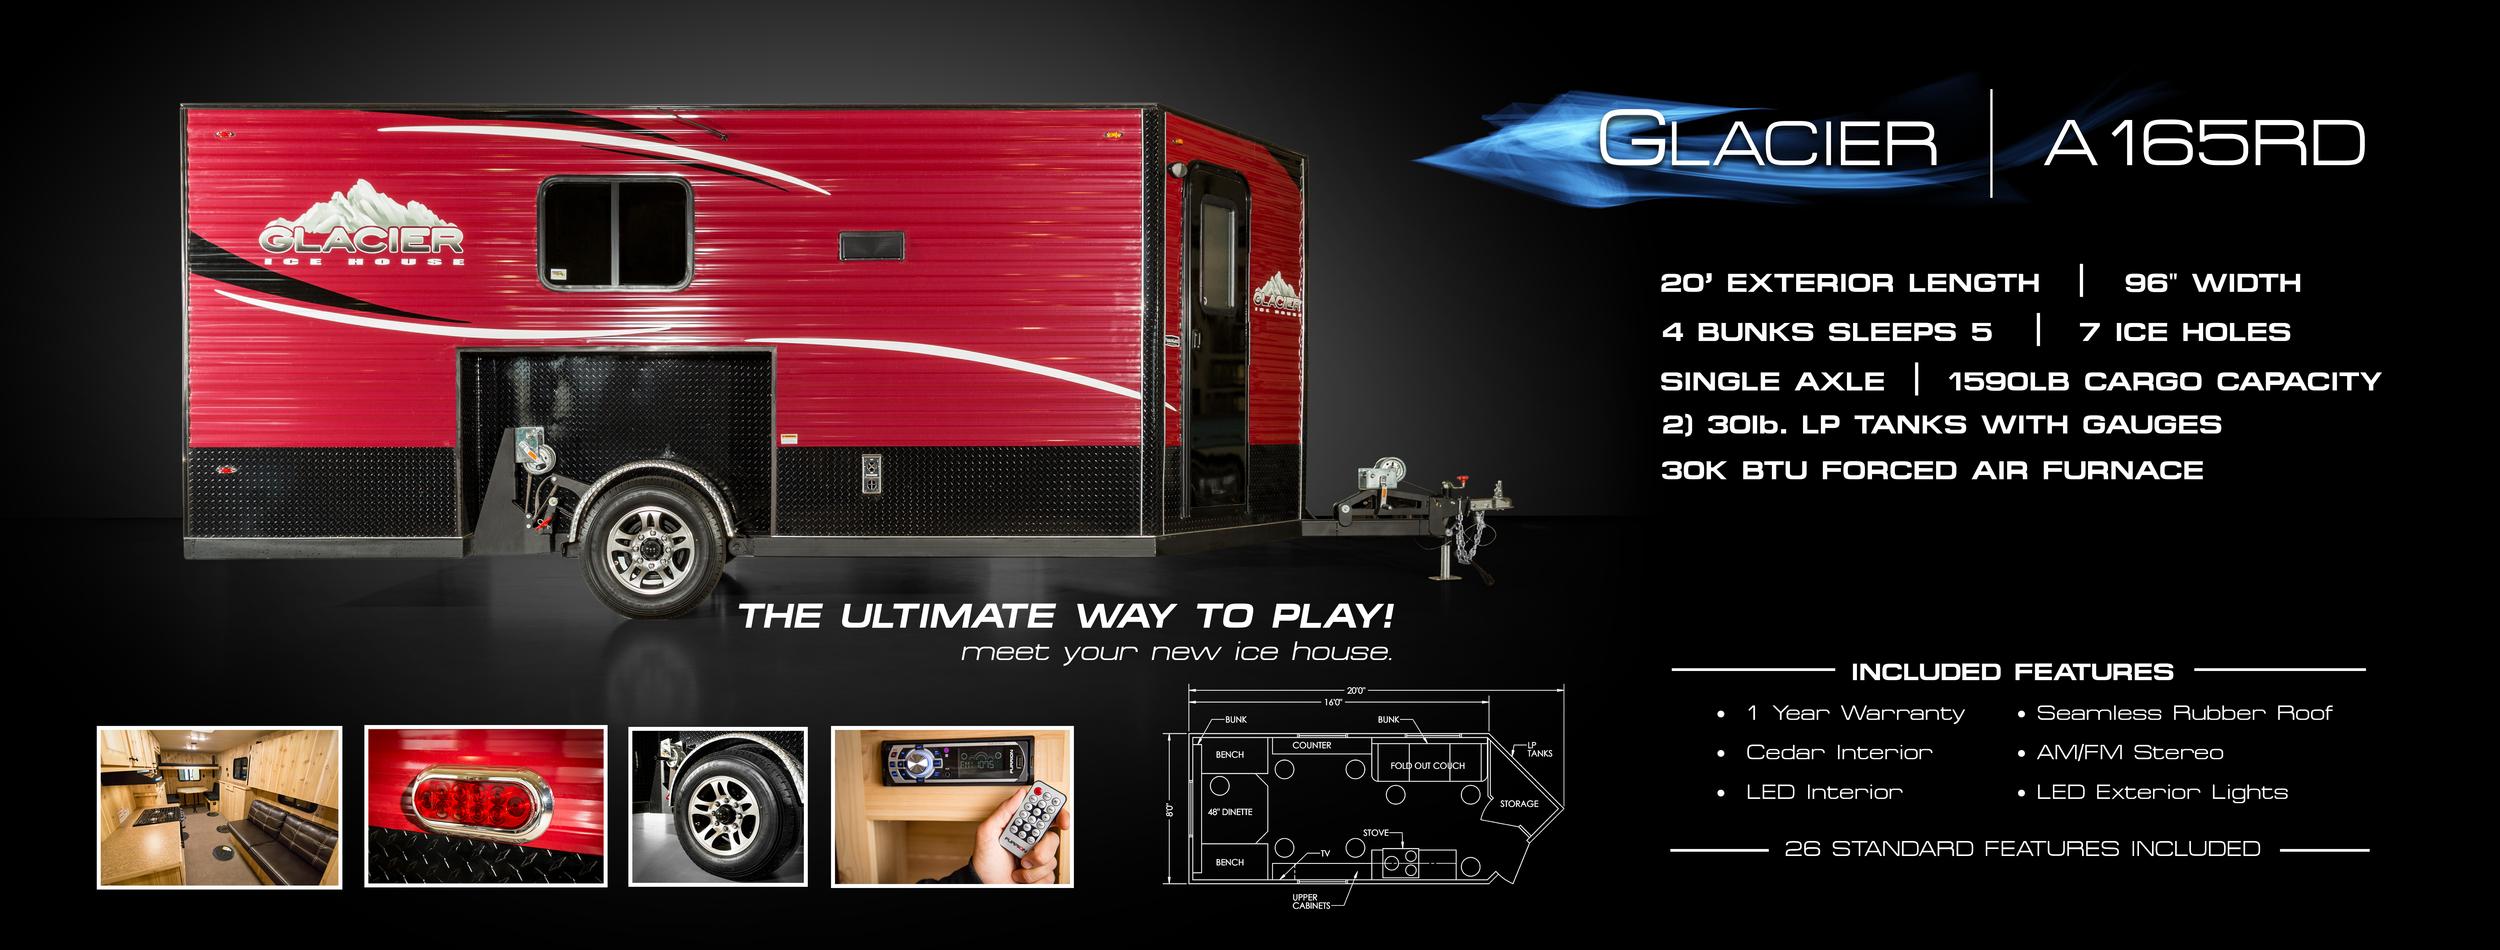 GLACIER A 165RD Layout FINAL.jpg